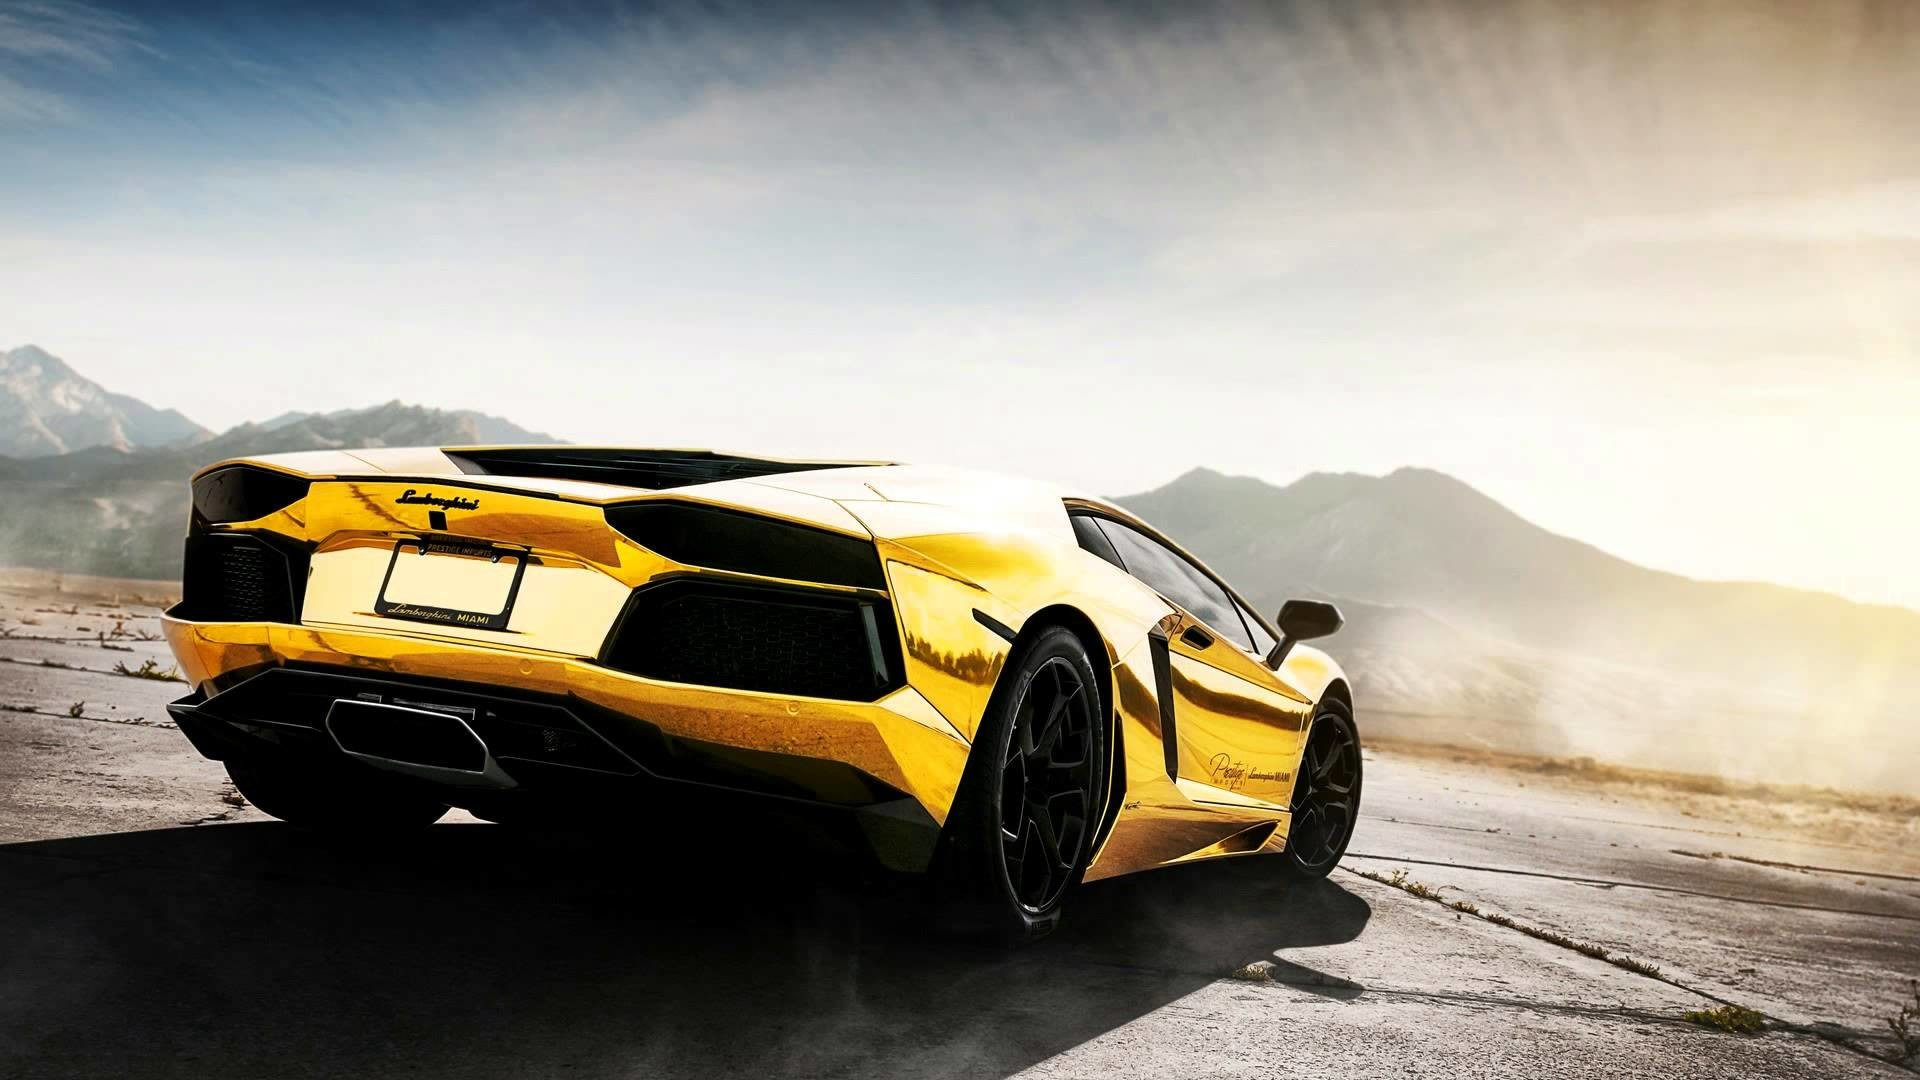 1920x1080 Lamborghini Wallpapers HD · Download · HD ...